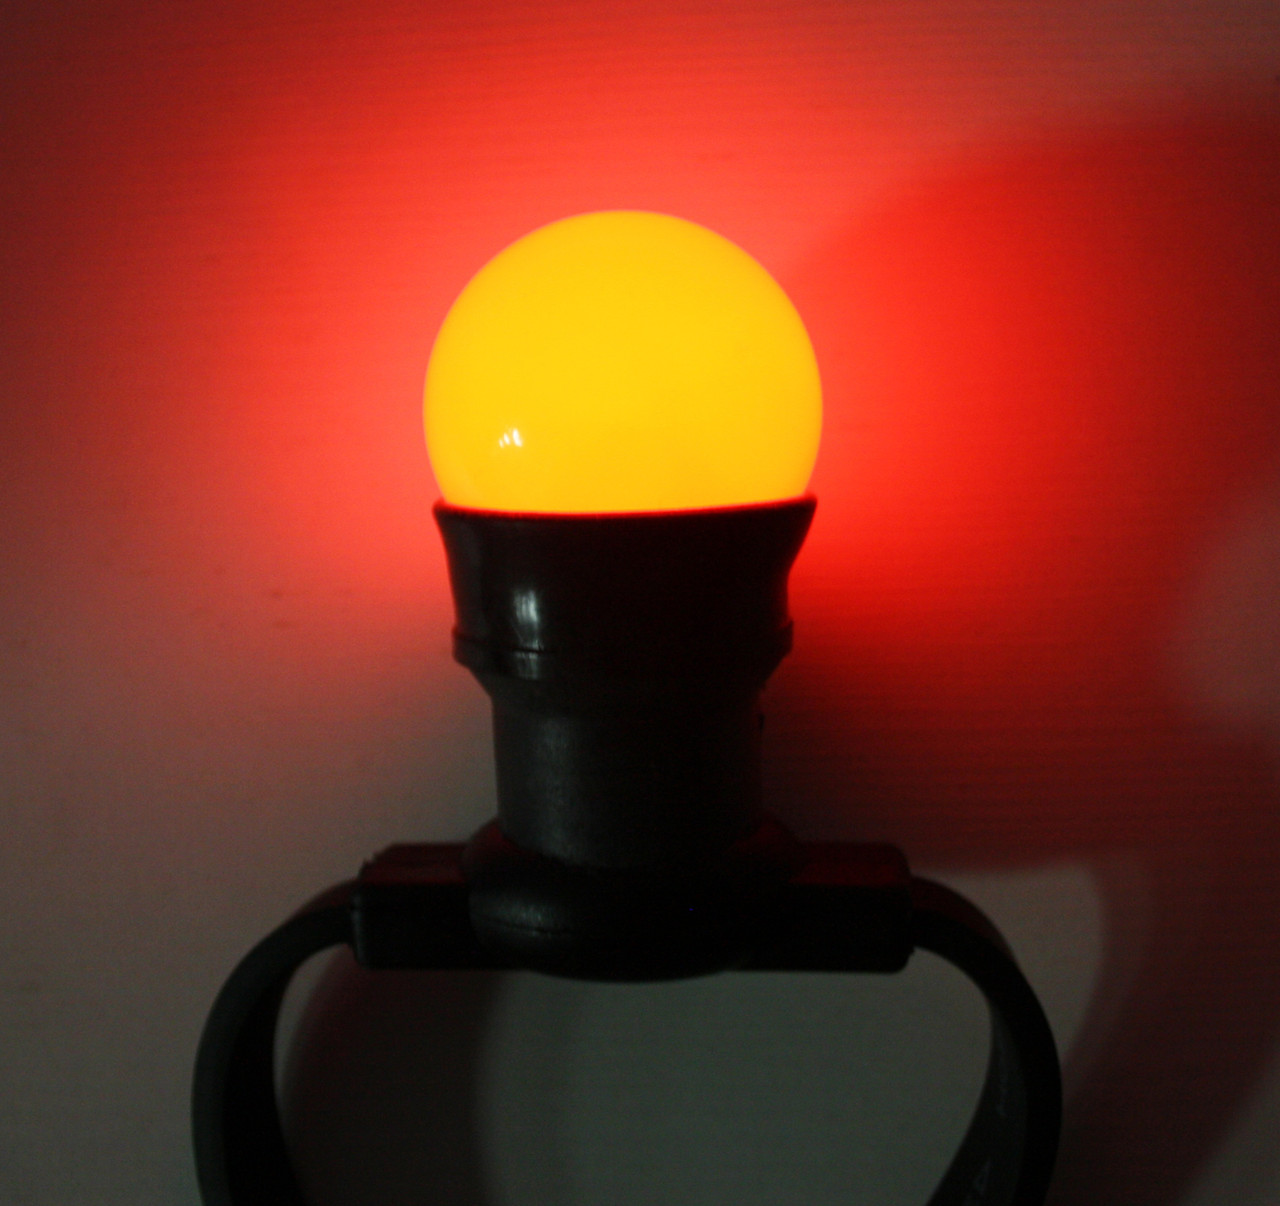 Уличная лампа для гирлянды Lumion Belt Light String (Белт лайт стринг) наружная цвет красный